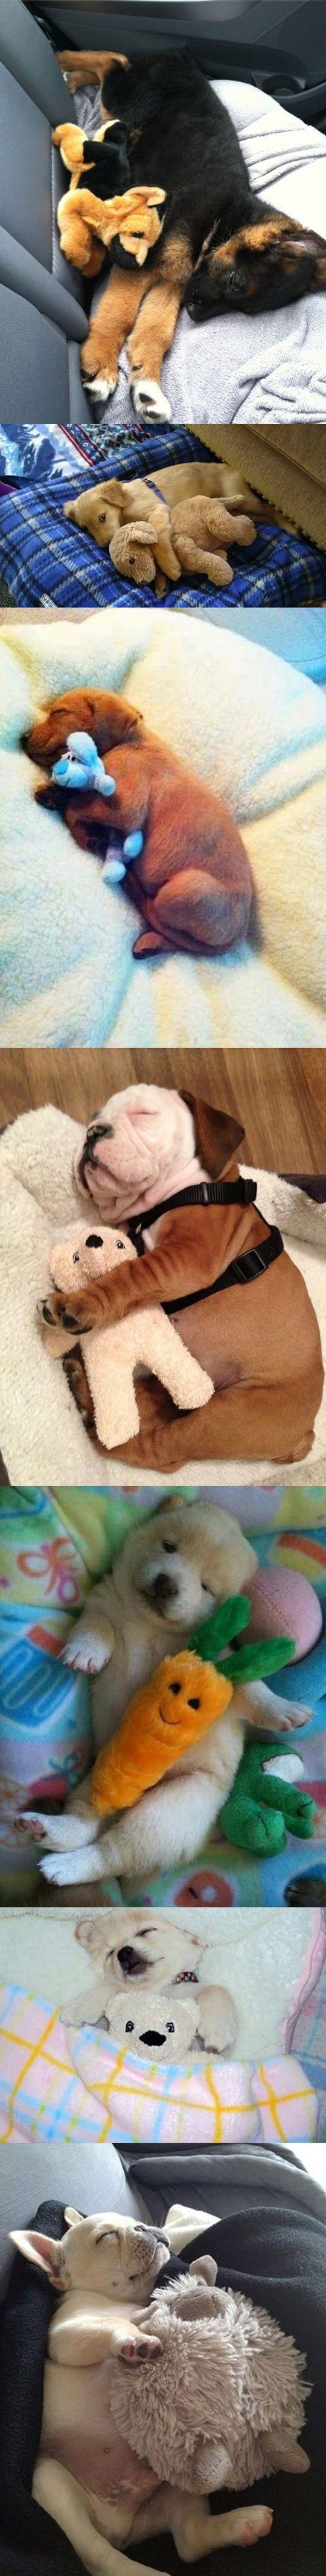 Sleeping And Cuddling